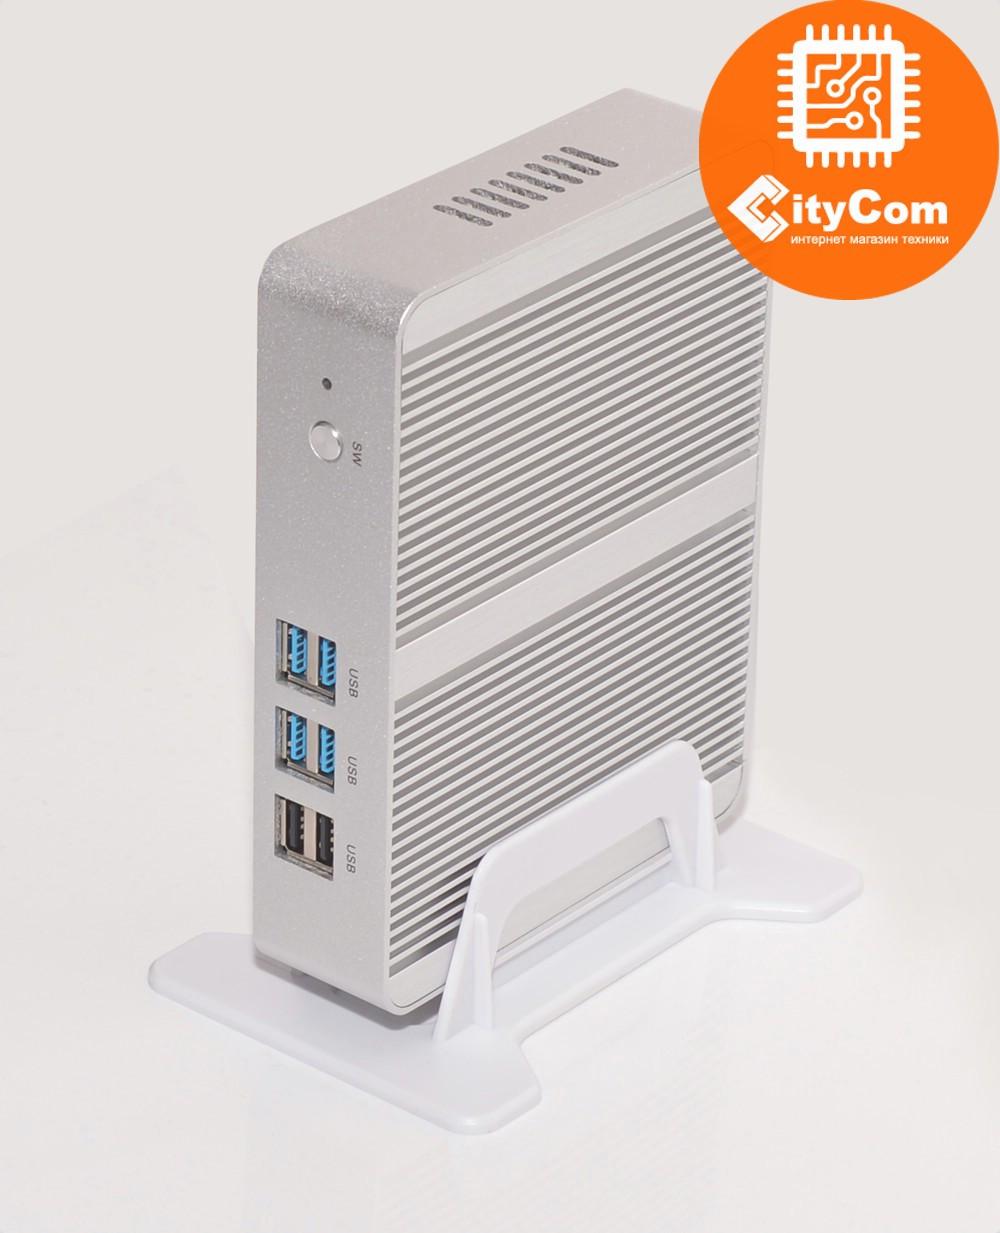 Неттоп Mini PC Mercury T4200Y Fanless. Мини ПК. Nettop. Тонкий клиент. Арт.4506